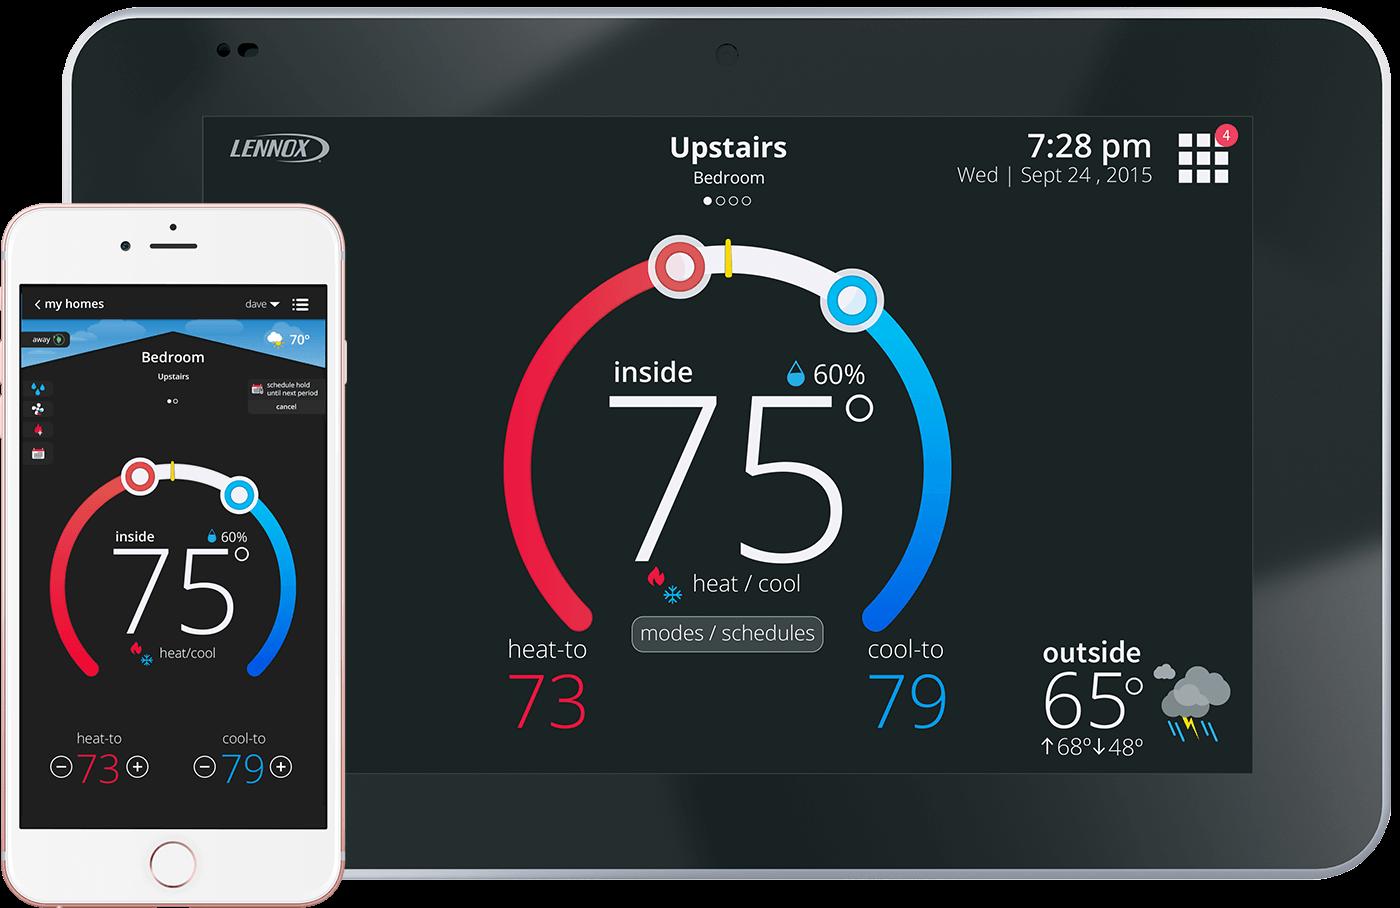 lennox icomfort s30. lennox icomfort s30 smart thermostat. view our work icomfort